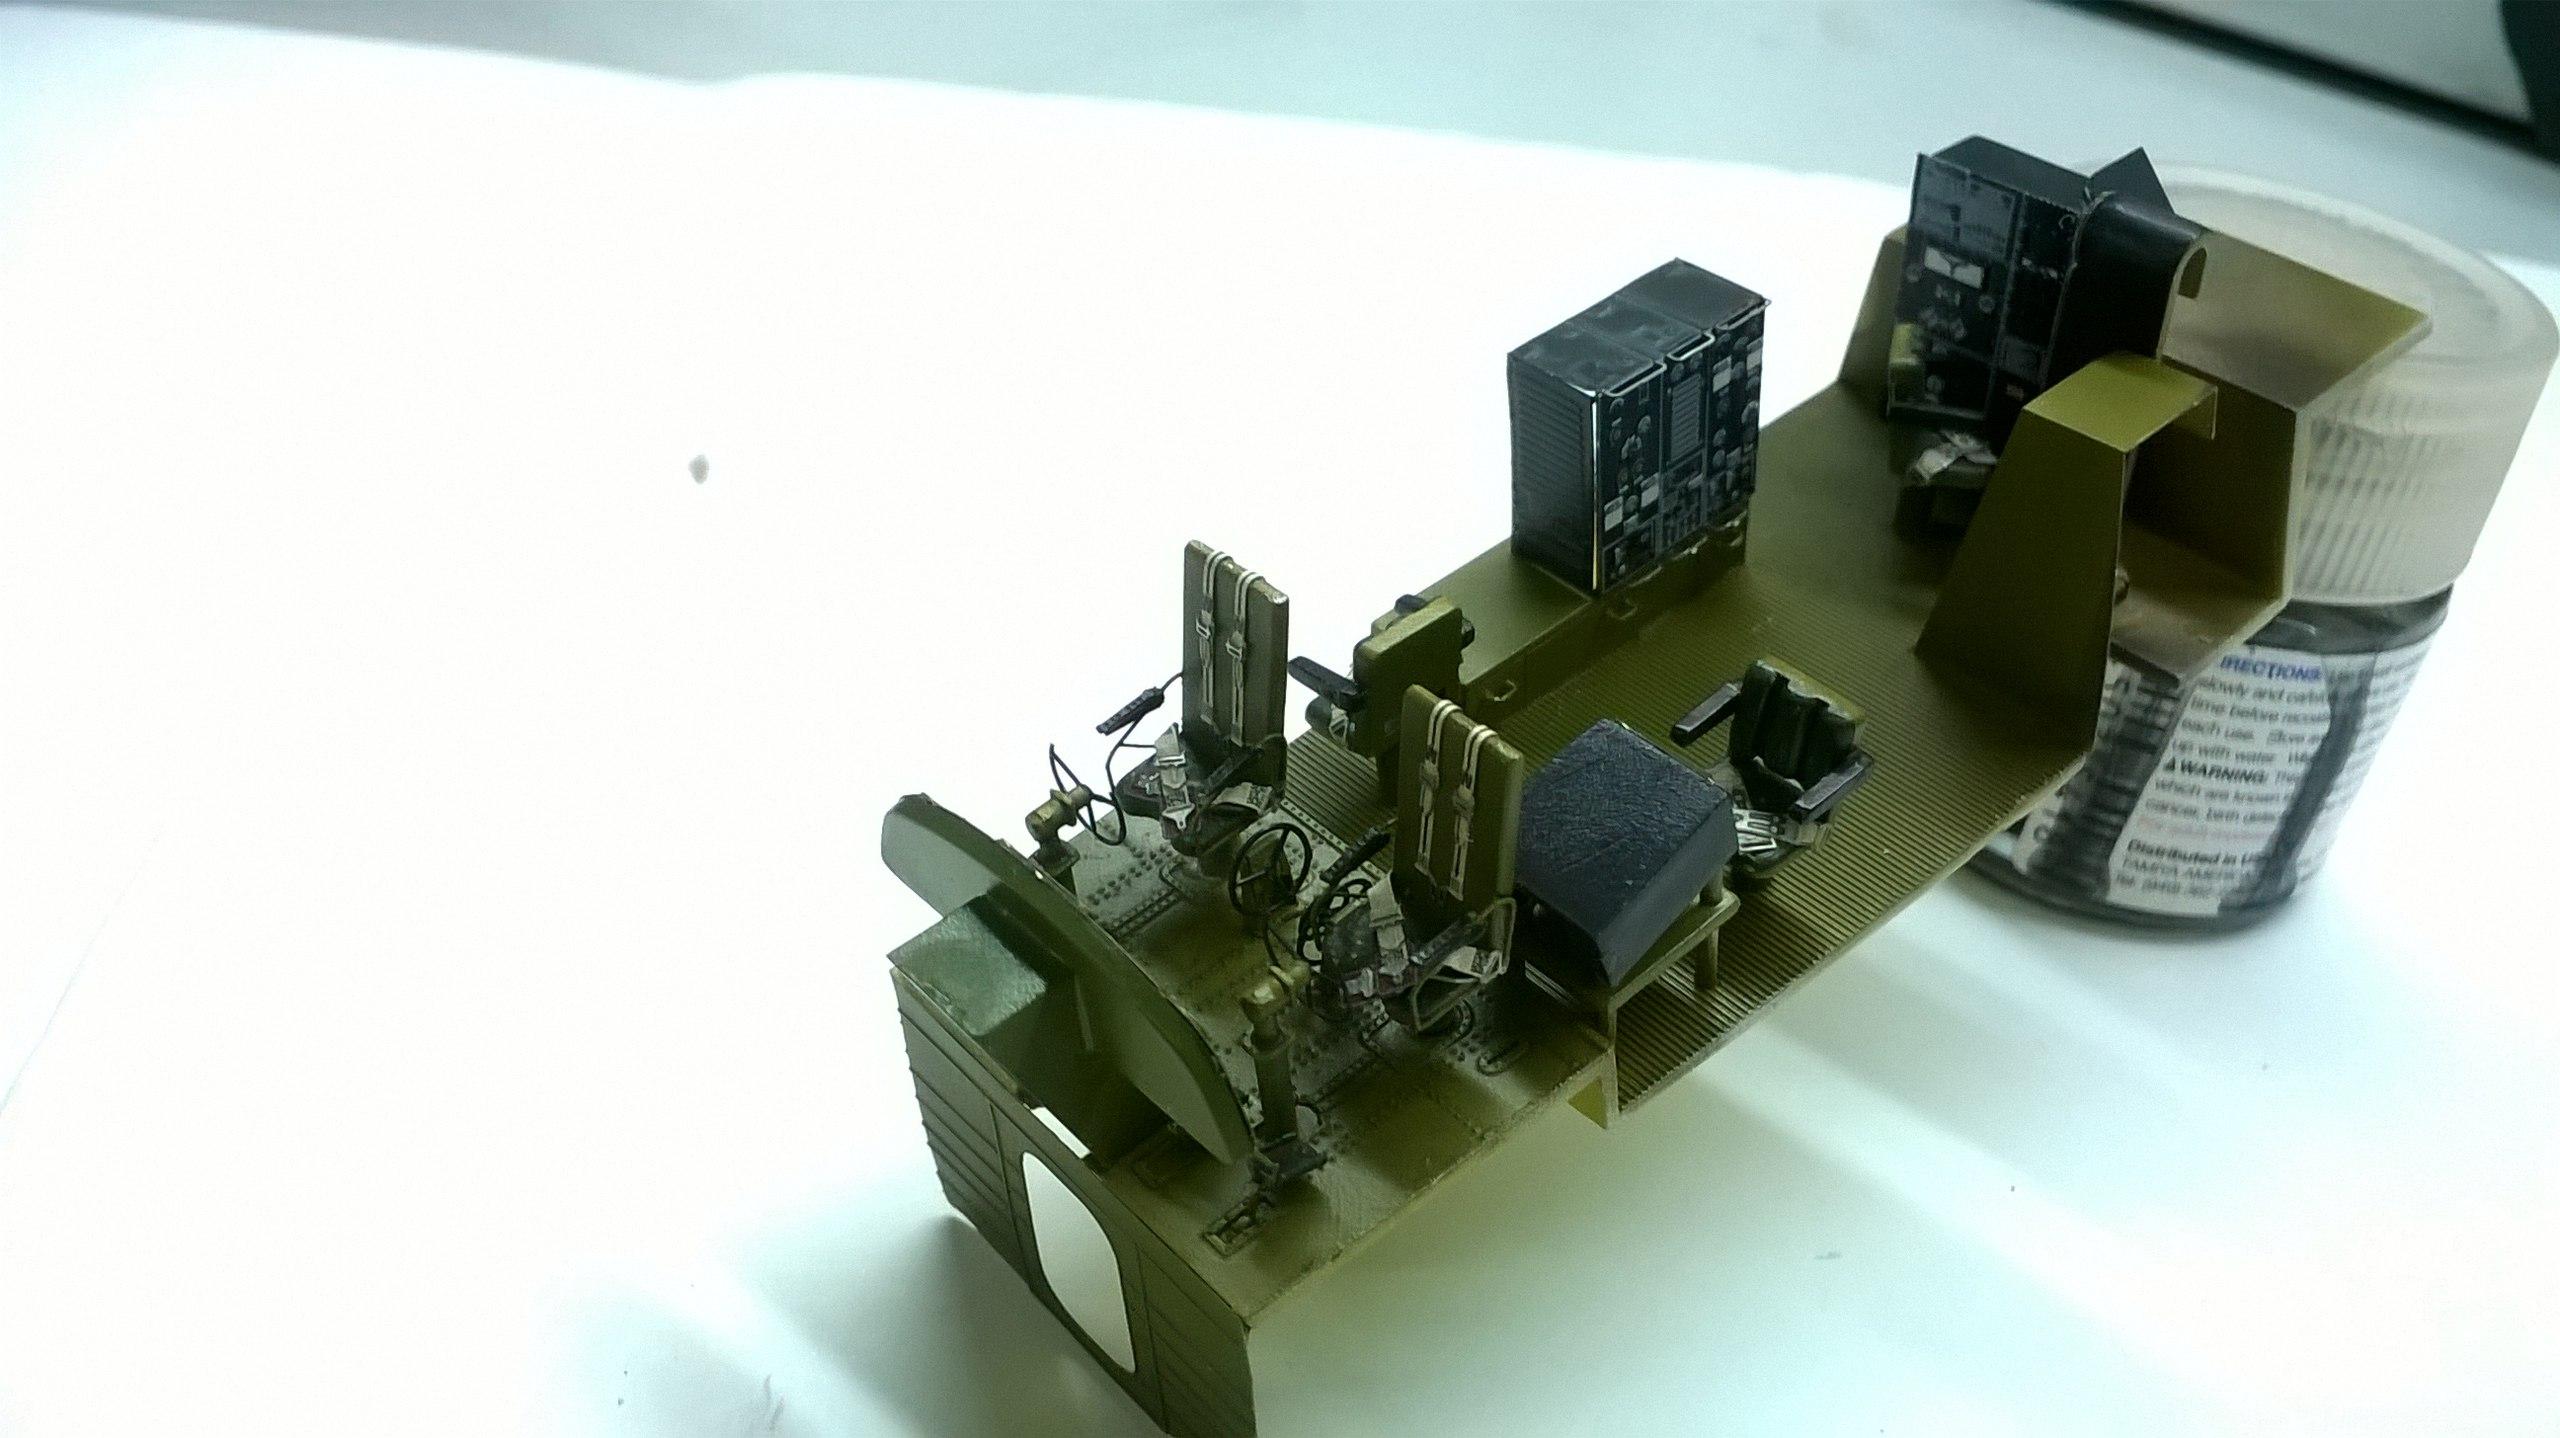 PBM-5 A MARINER 1/72 (MINICRAFT) C2npjtB6WYs